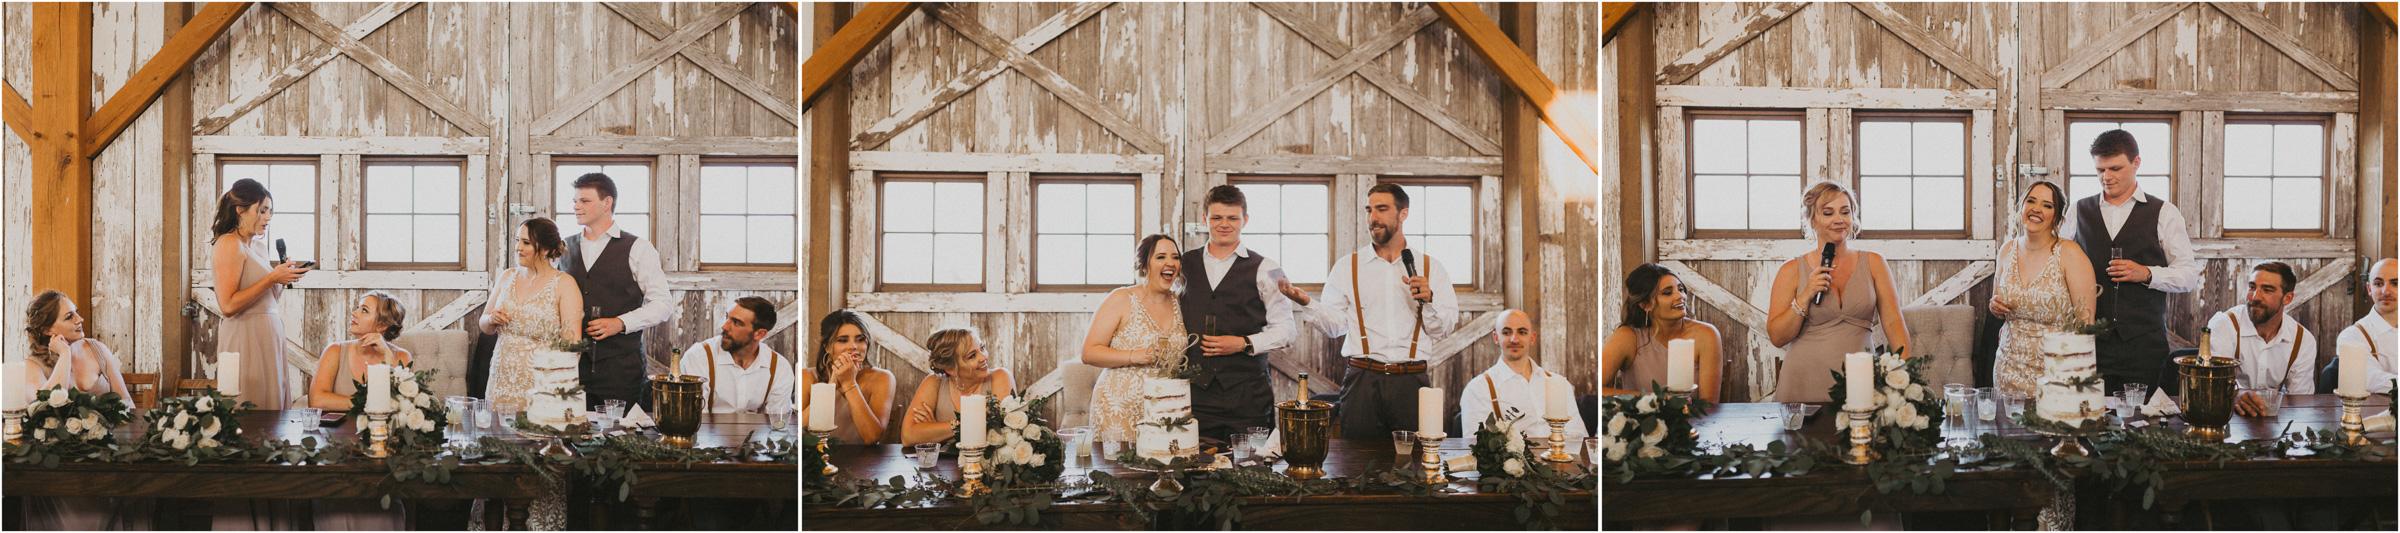 alyssa barletter photography weston red barn farm timberbarn summer outdoor wedding-59.jpg